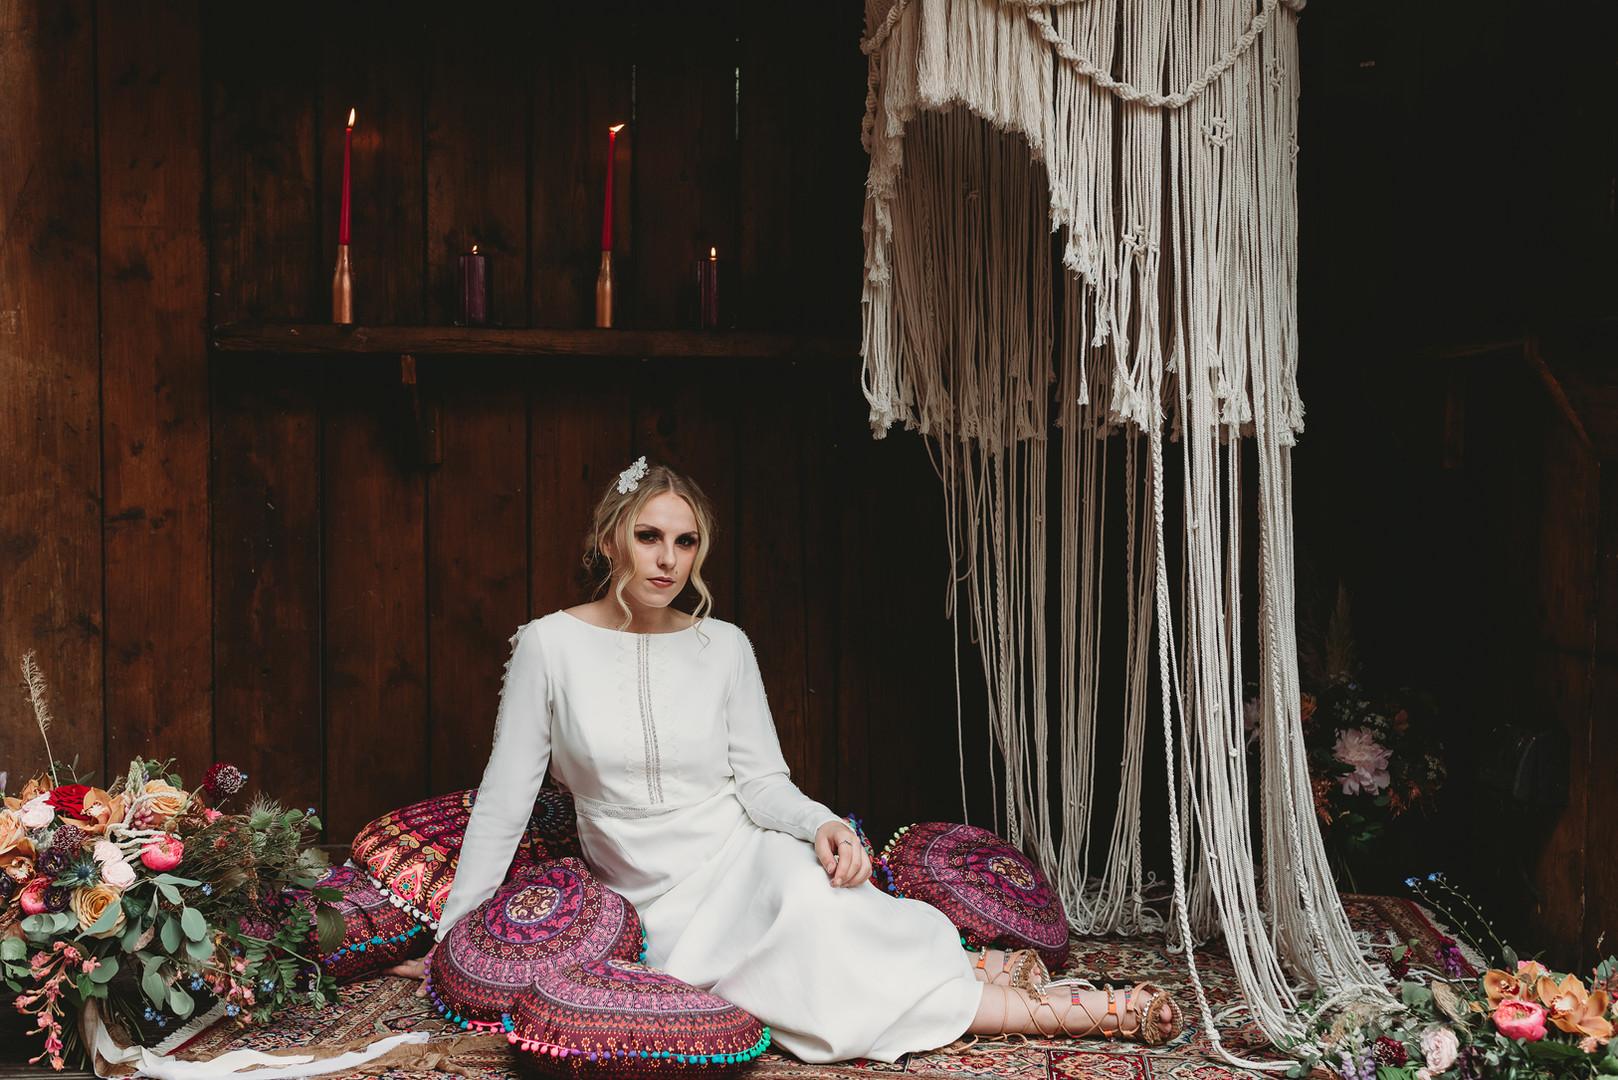 Bohemian wedding inspo